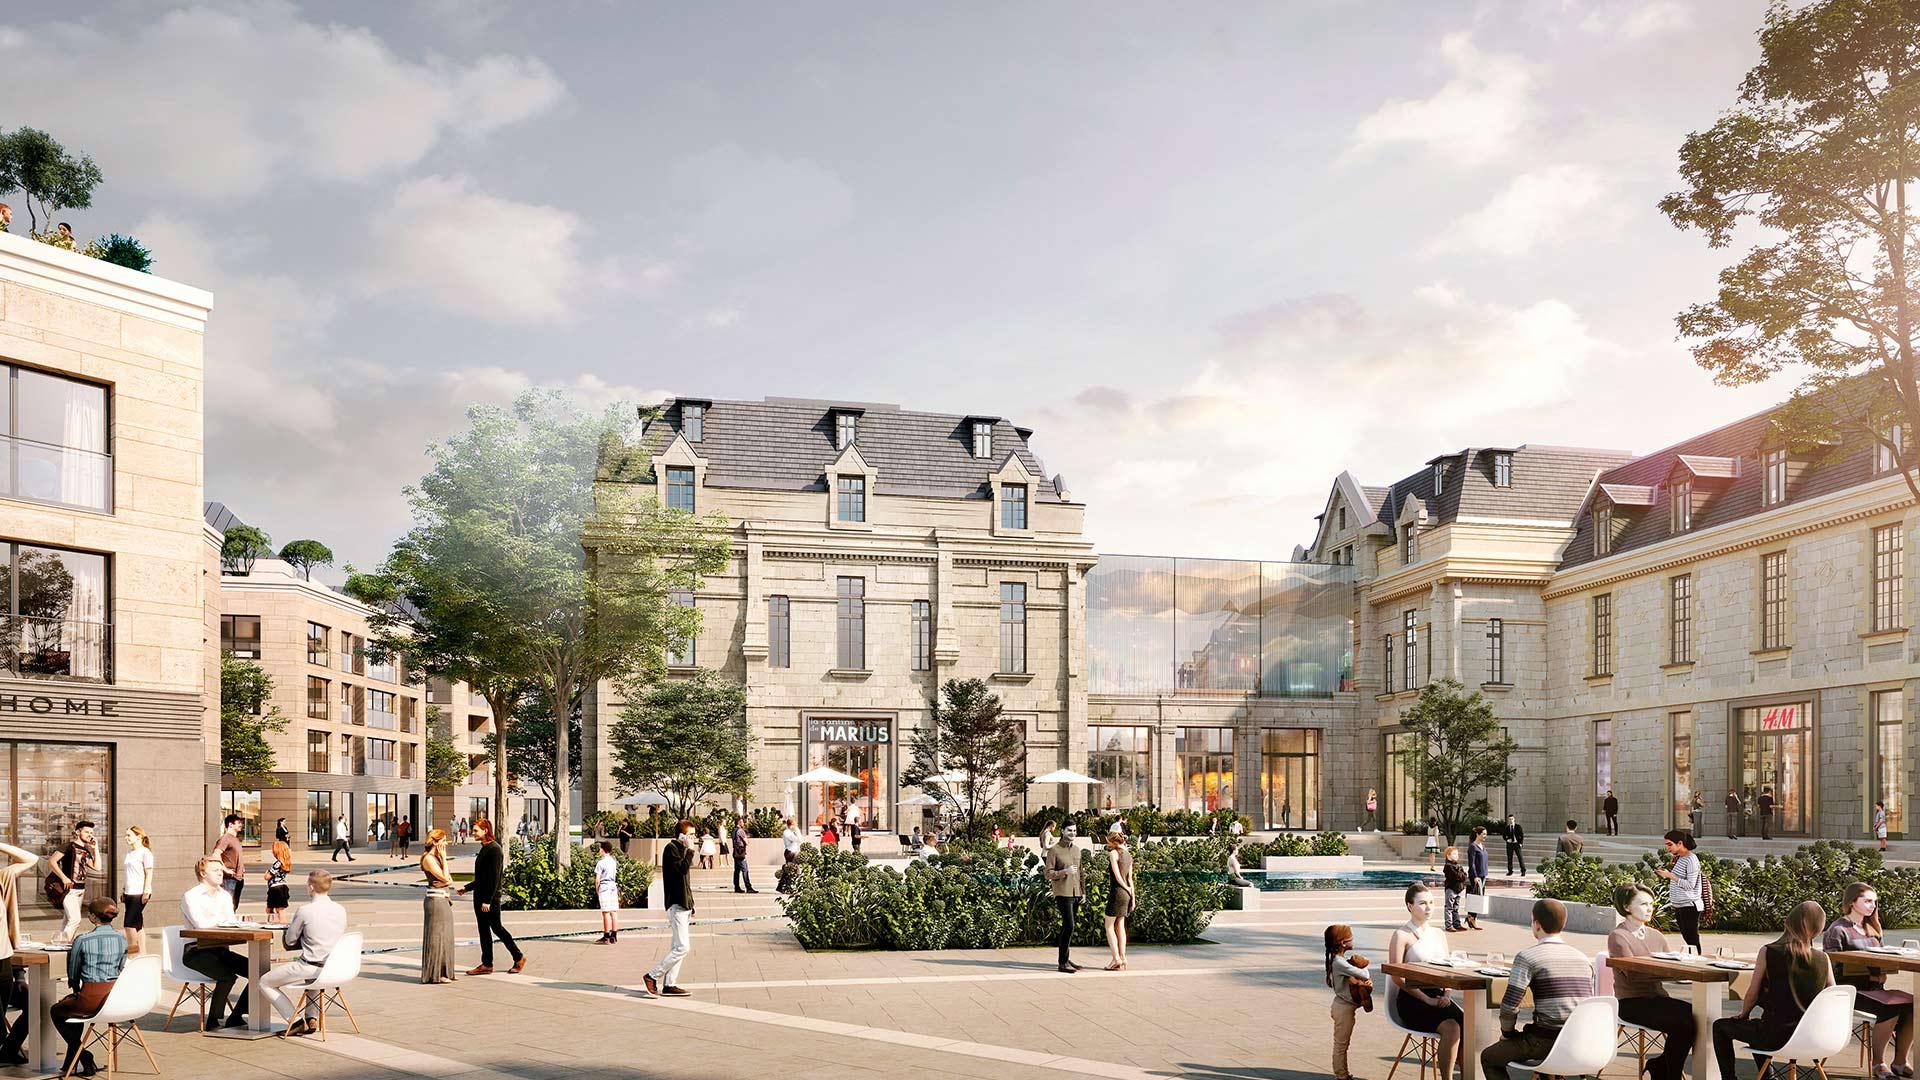 sodes-projets_en_cours_saint_germain_en_laye1